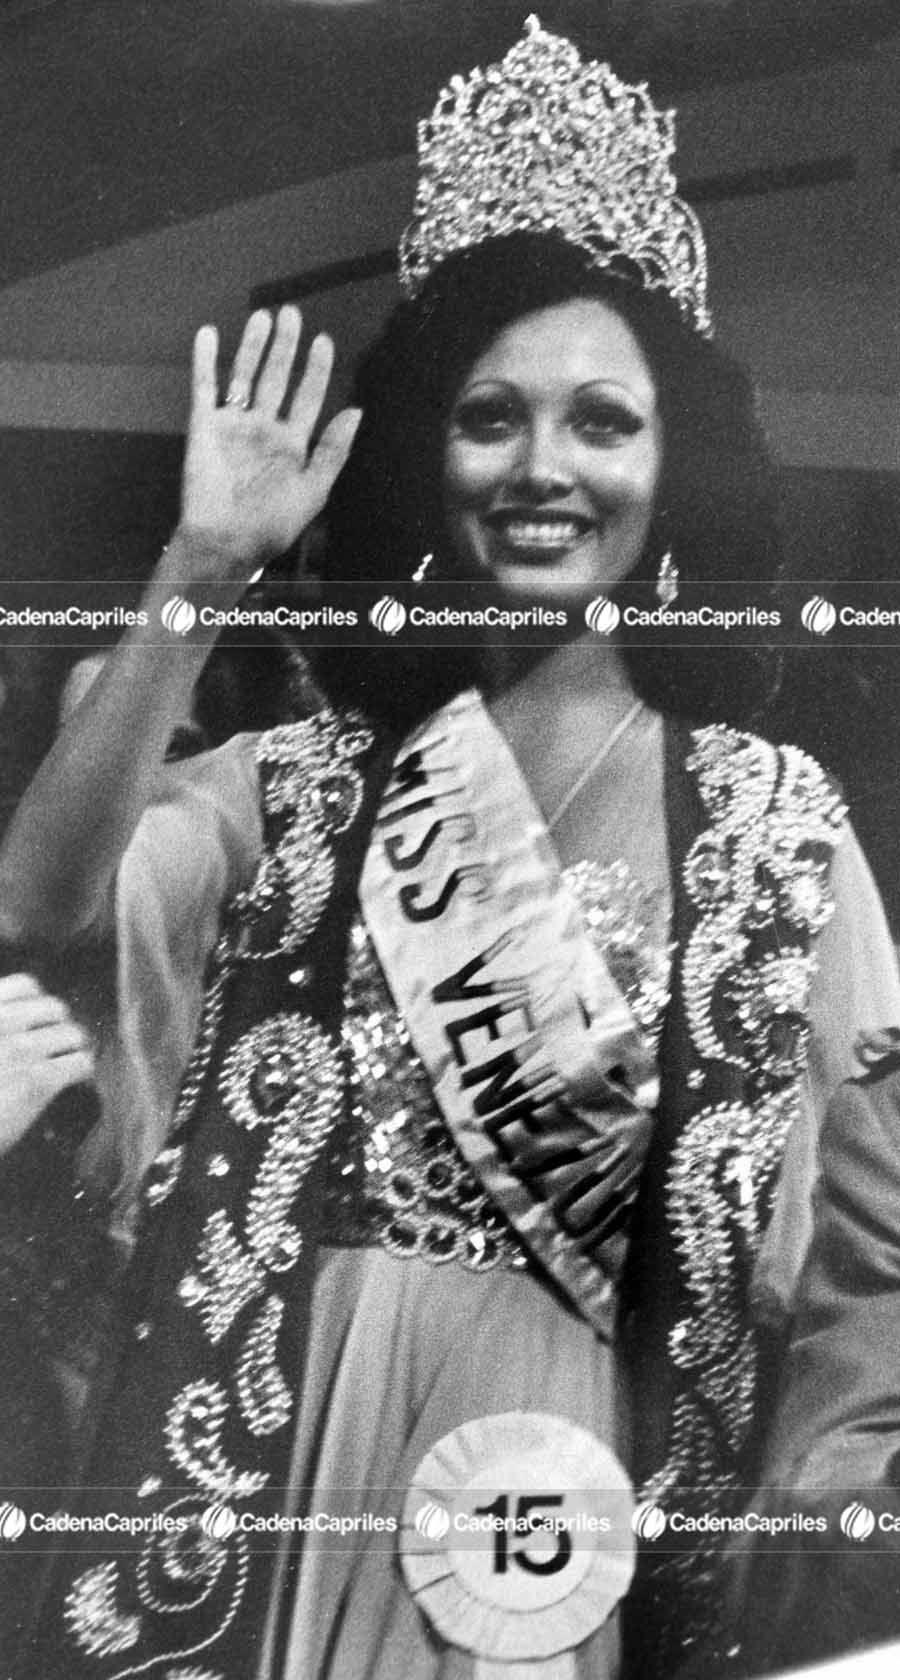 Miss Venezuela 1974, Neyla Moronta Sangronis. Foto: Archivo Fotográfico/Cadena Capriles